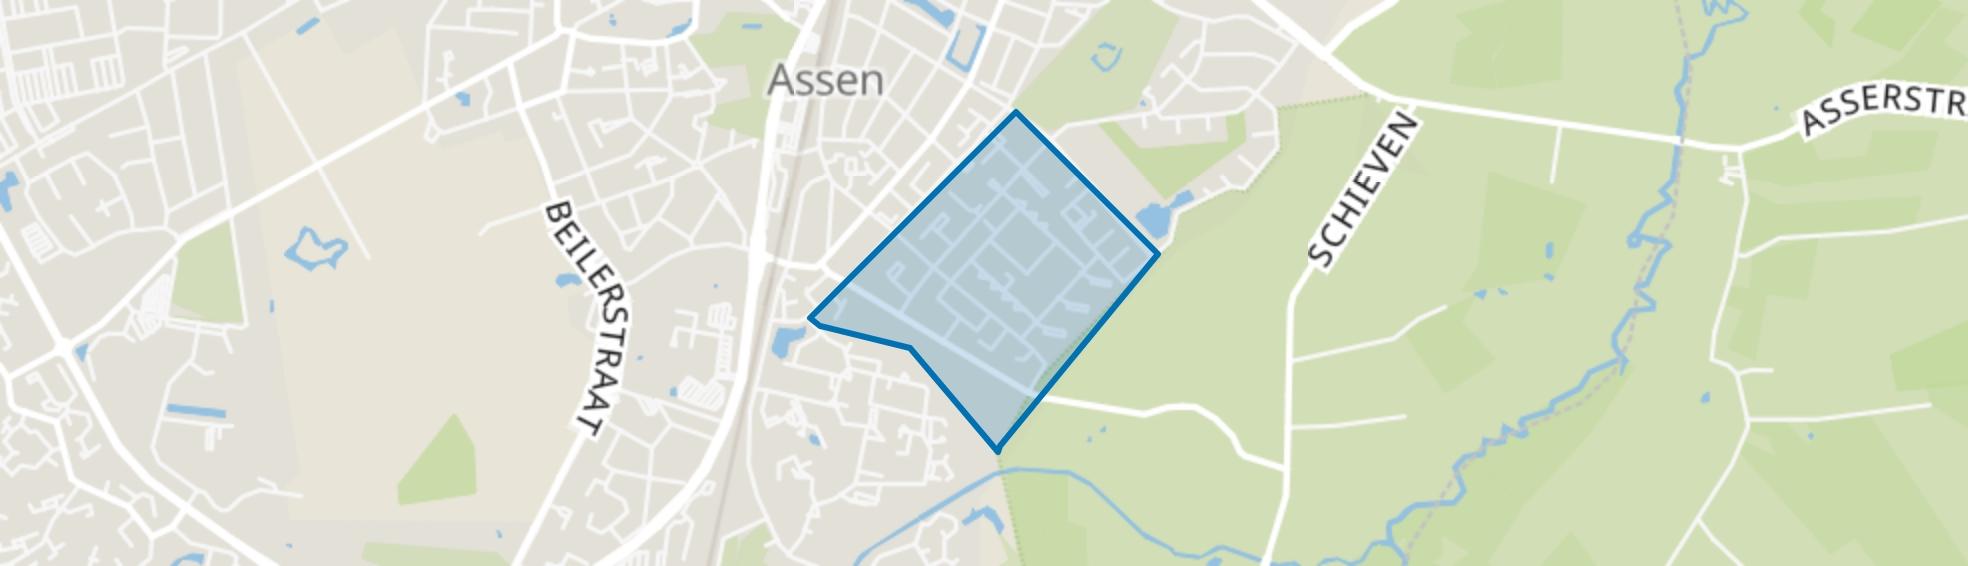 Vredeveld Zuid, Assen map